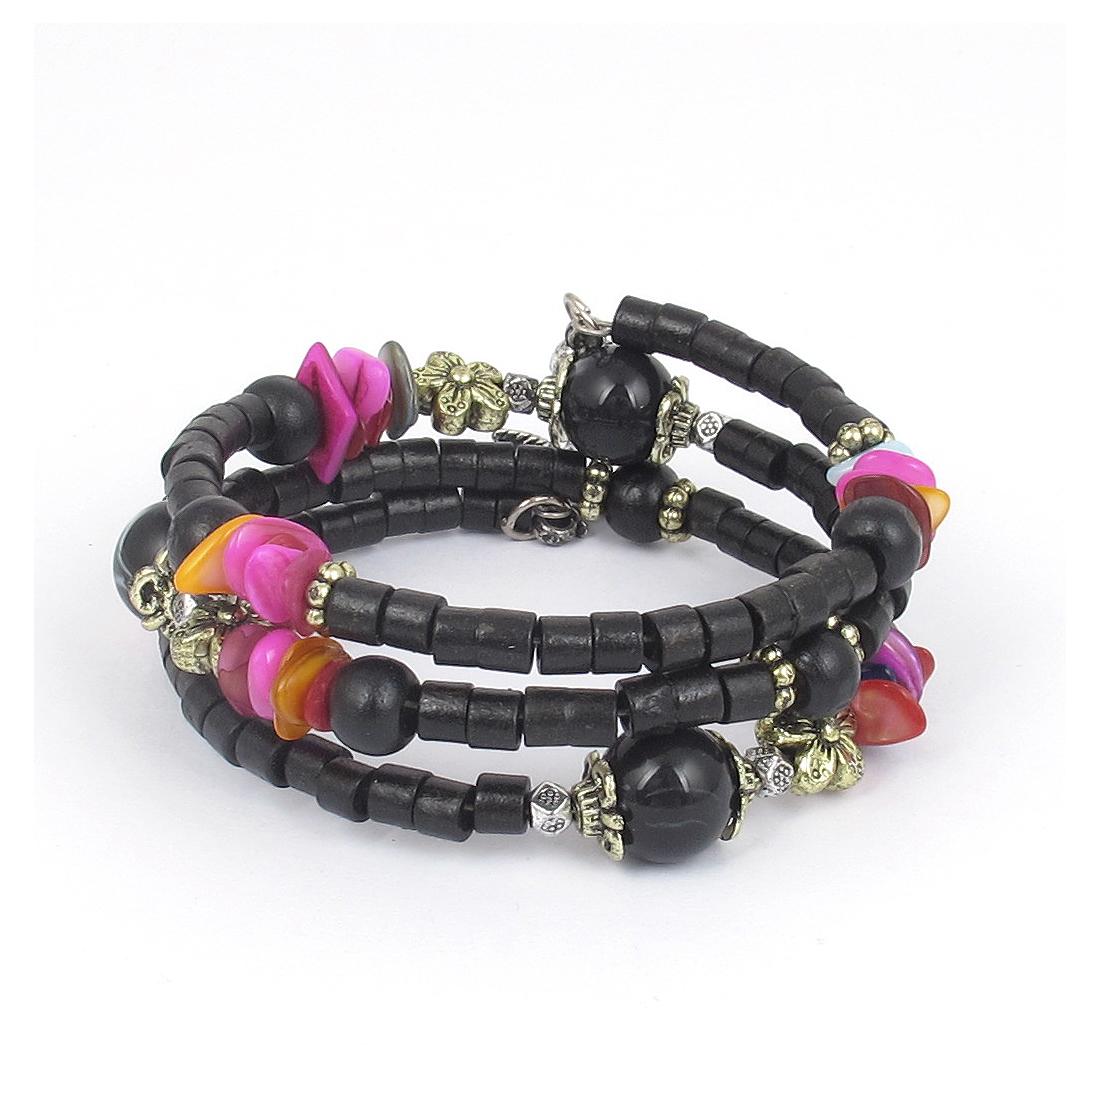 Women Handmade National Style Wooden Cylinder Beads Flower Decor 3-layer Bangle Bracelet Black